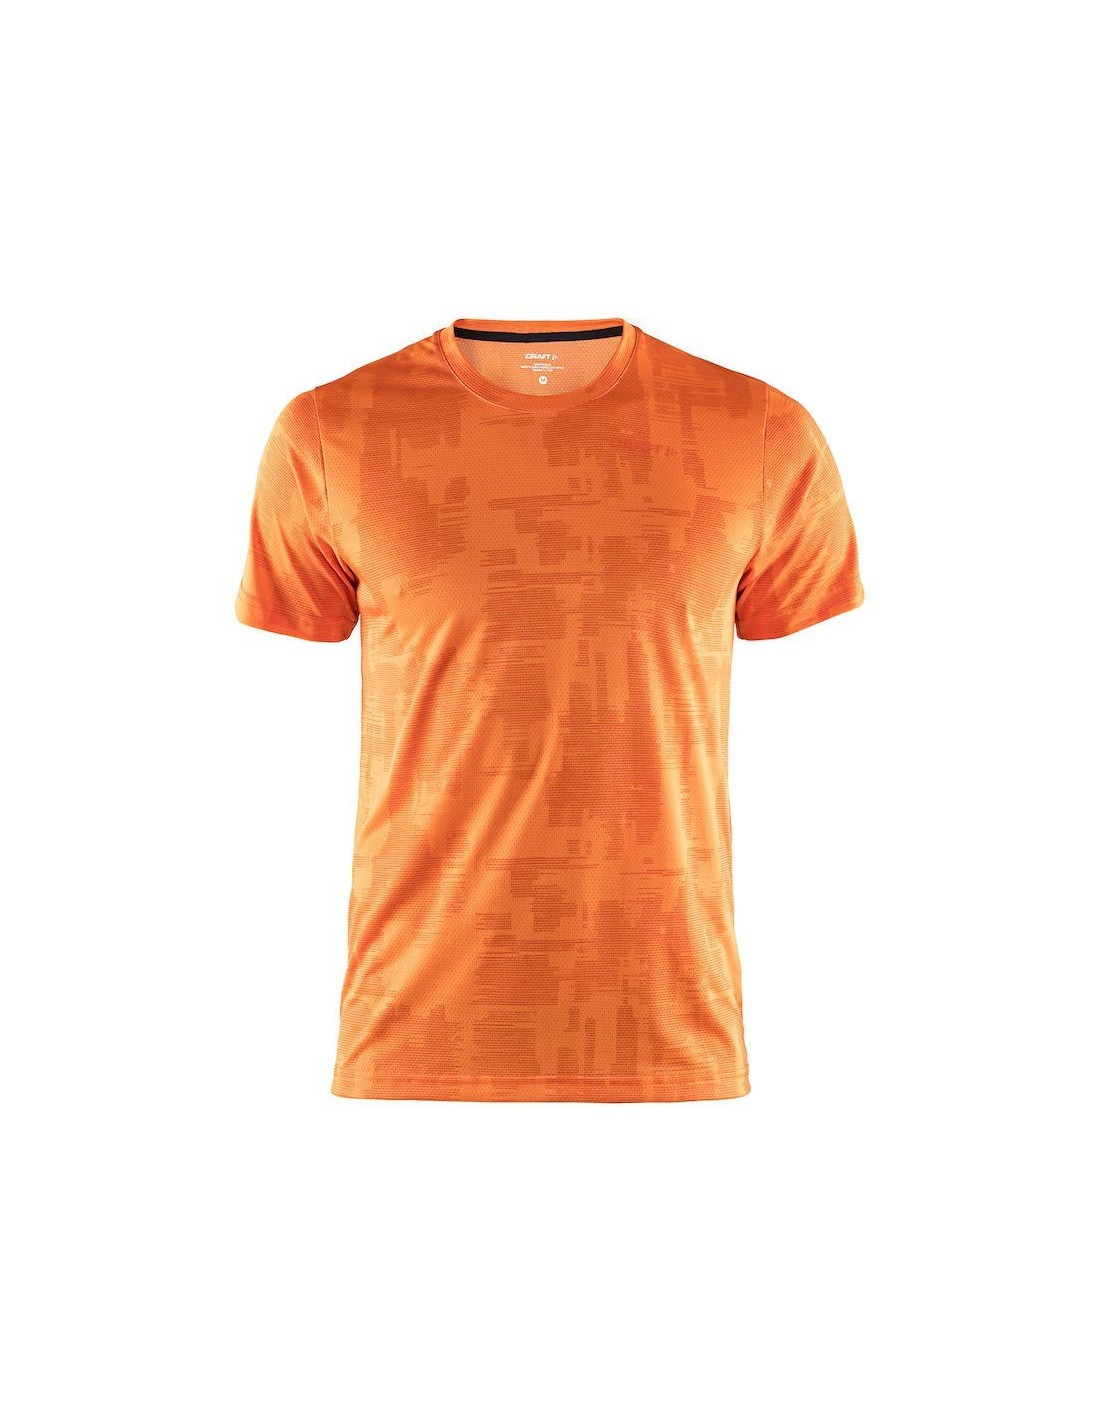 588fd7635 Koszulka męska Craft Eaze SS Tee, pomarańczowa - STSklep